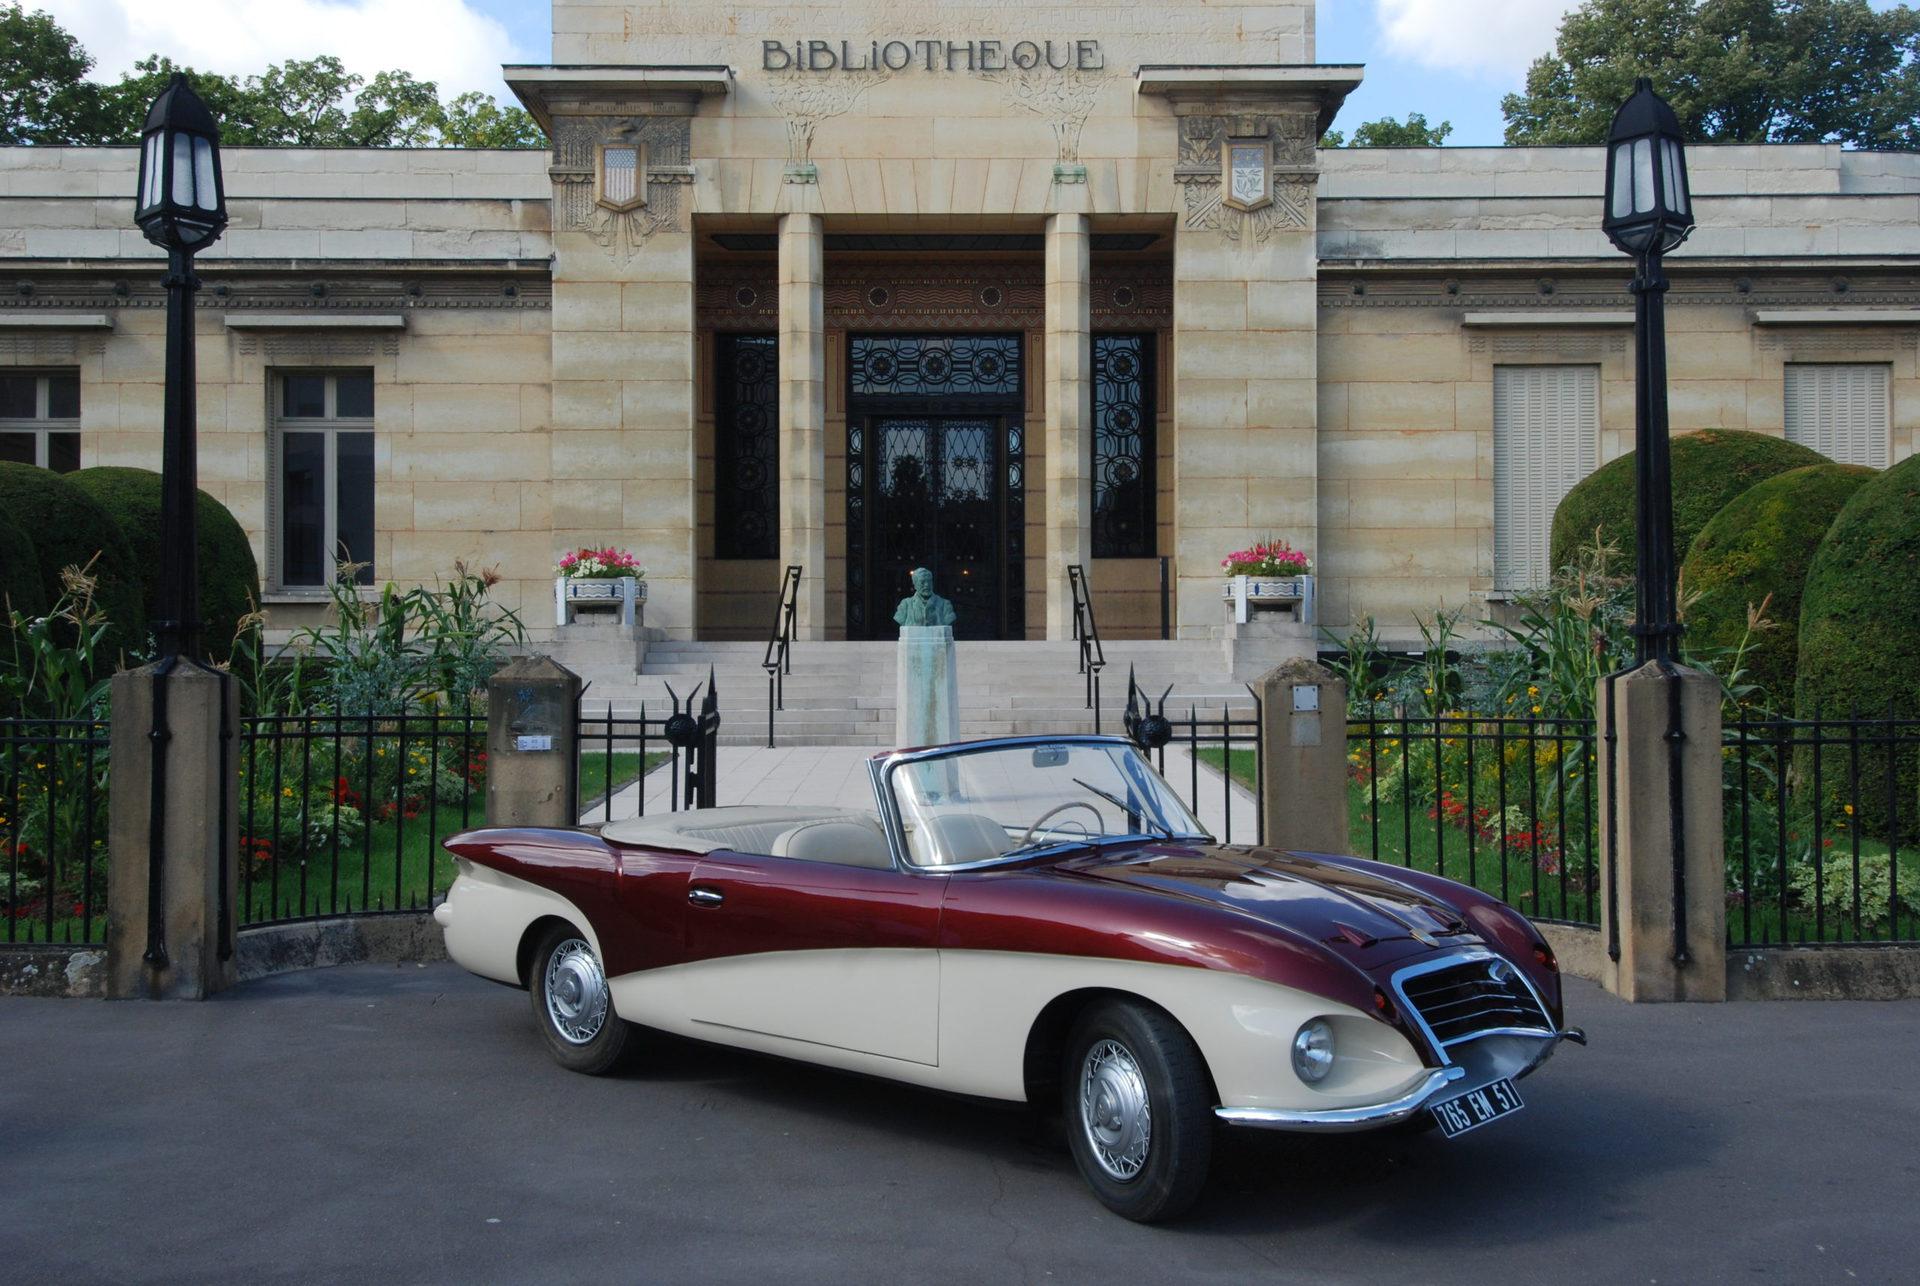 Peugeot Radovitch 403 - Musée Reims